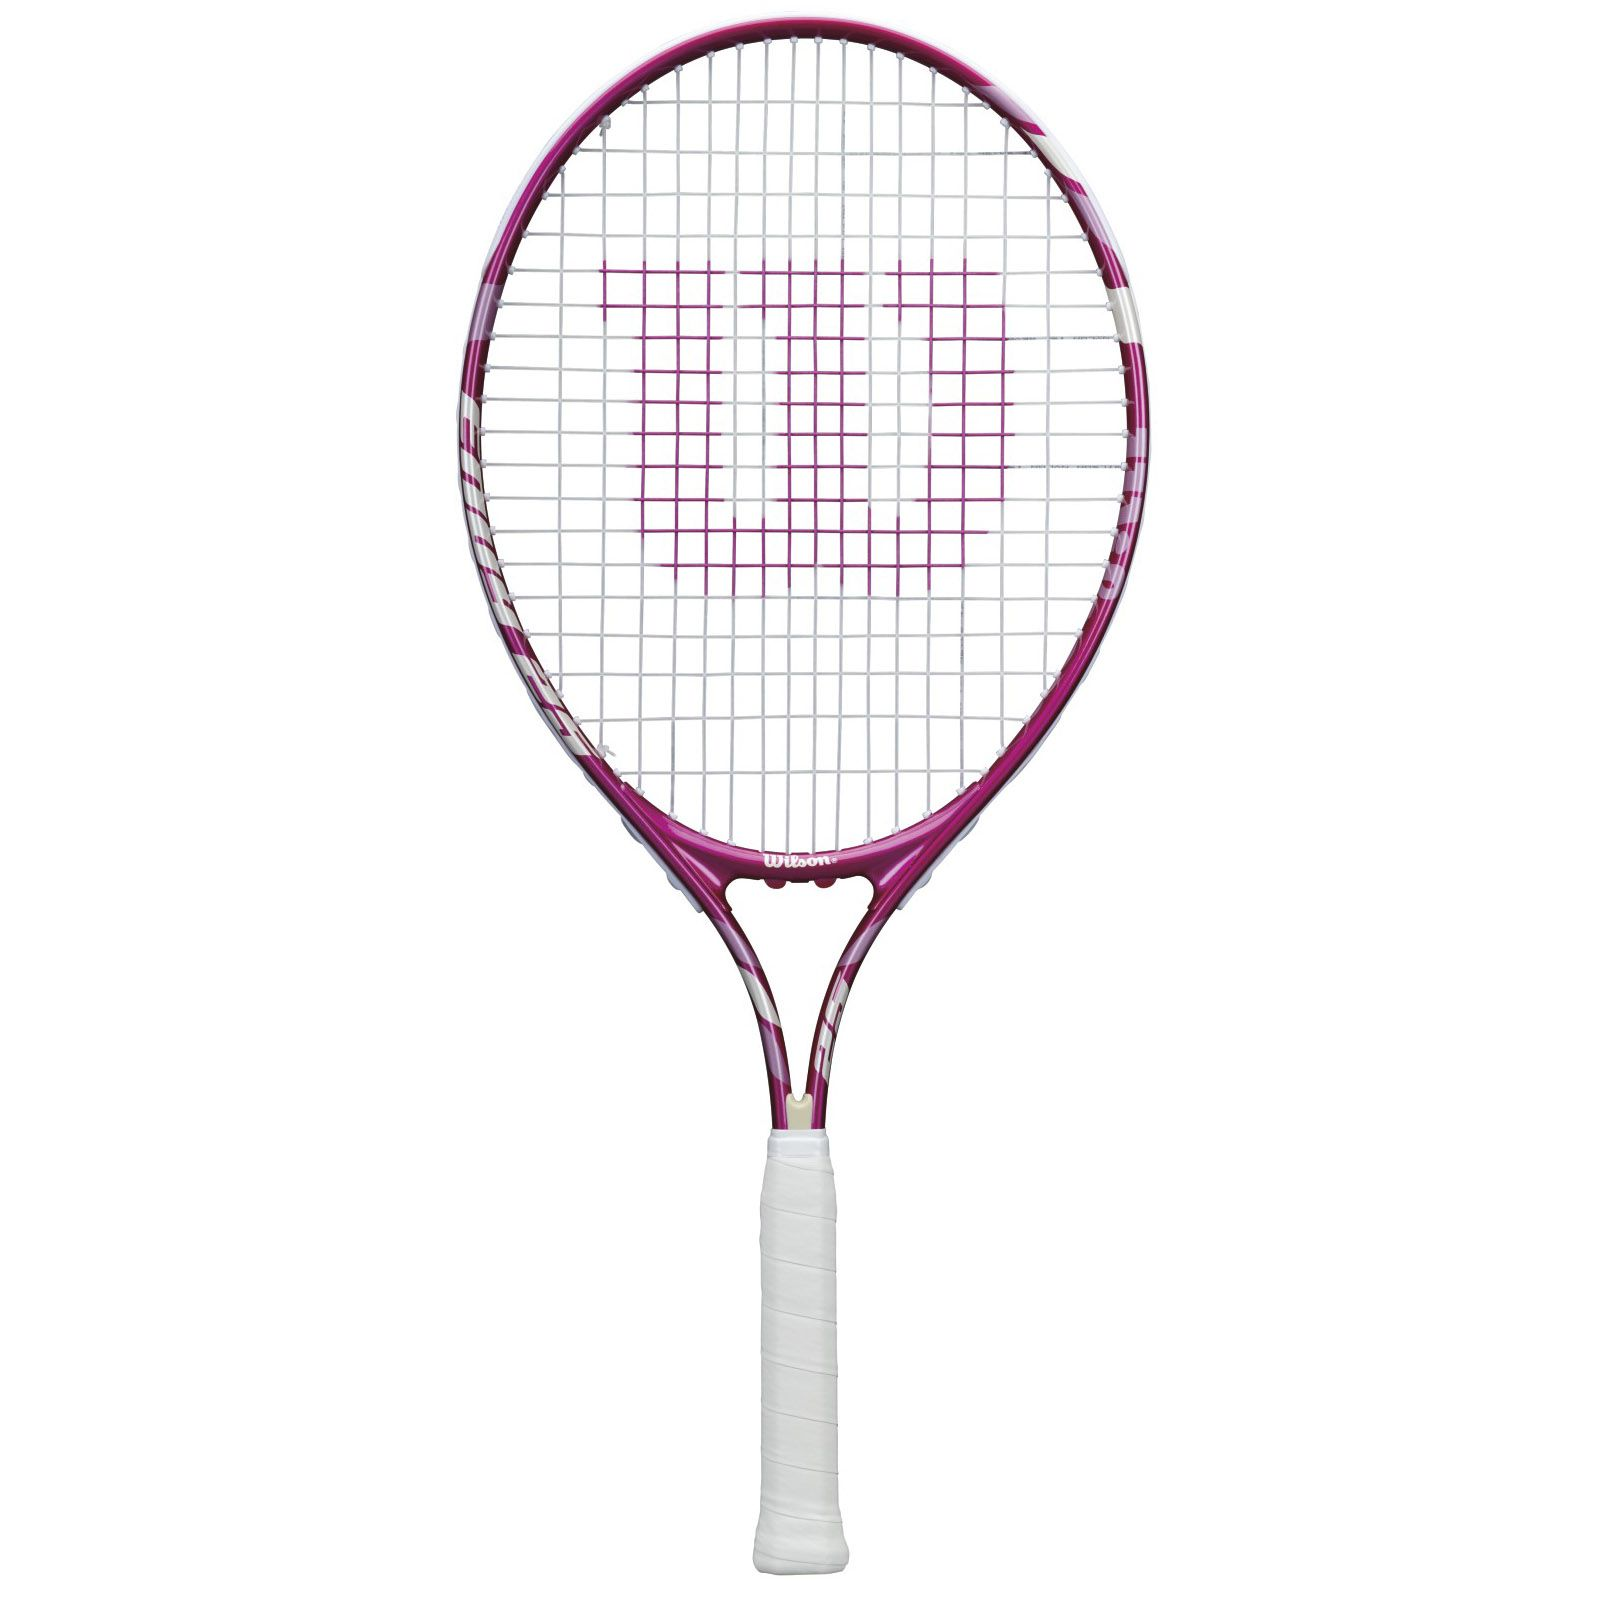 Wilson Envy Junior Pink 25 Tennis Racket - Sweatband.com